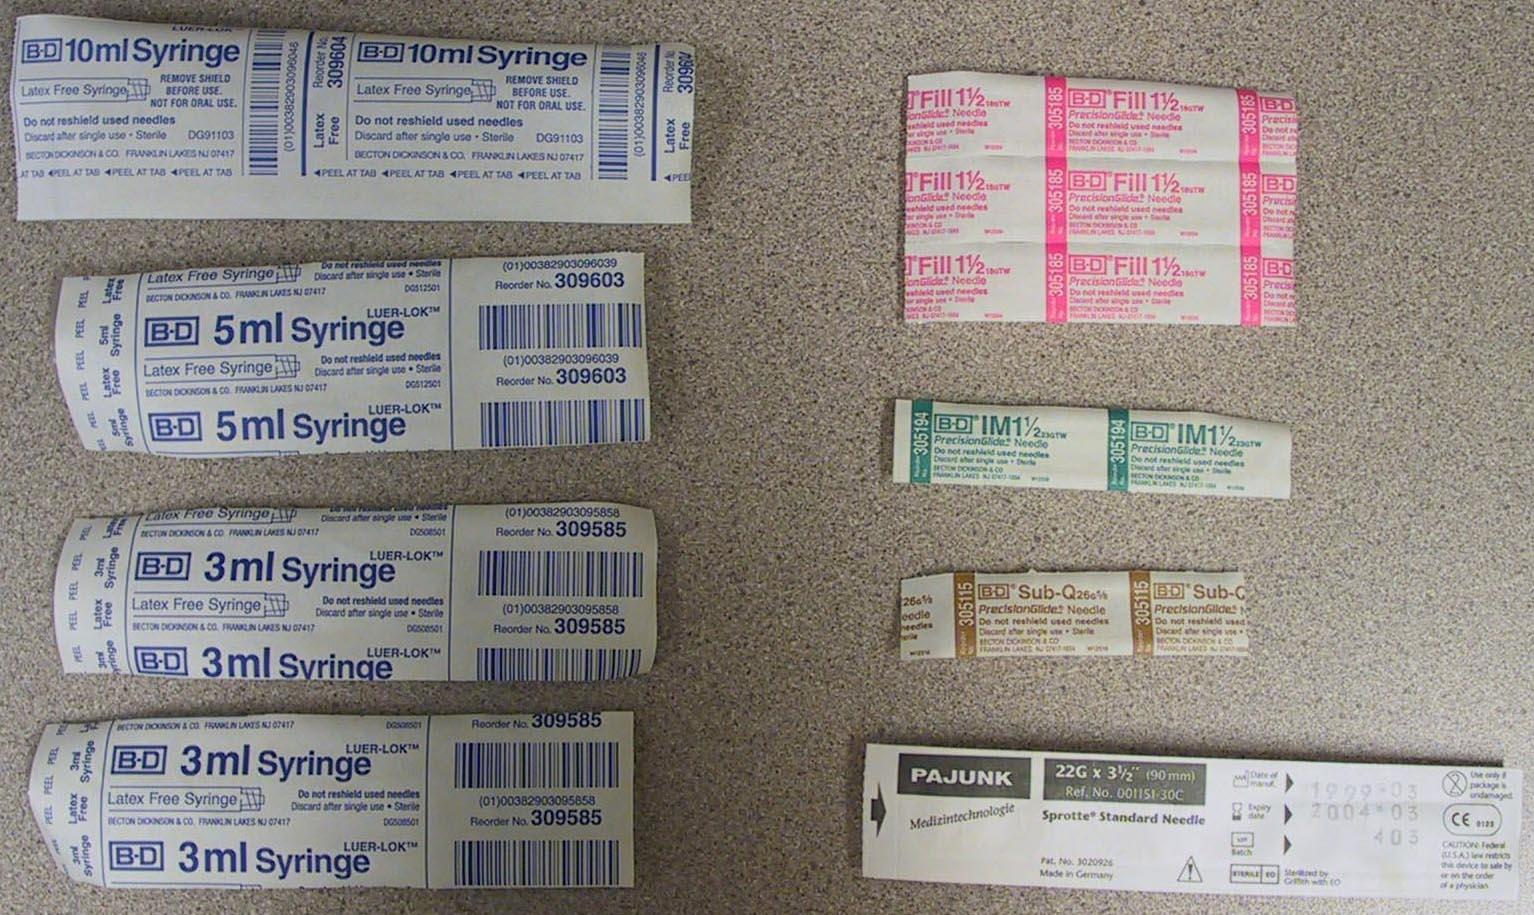 18g needles steroids